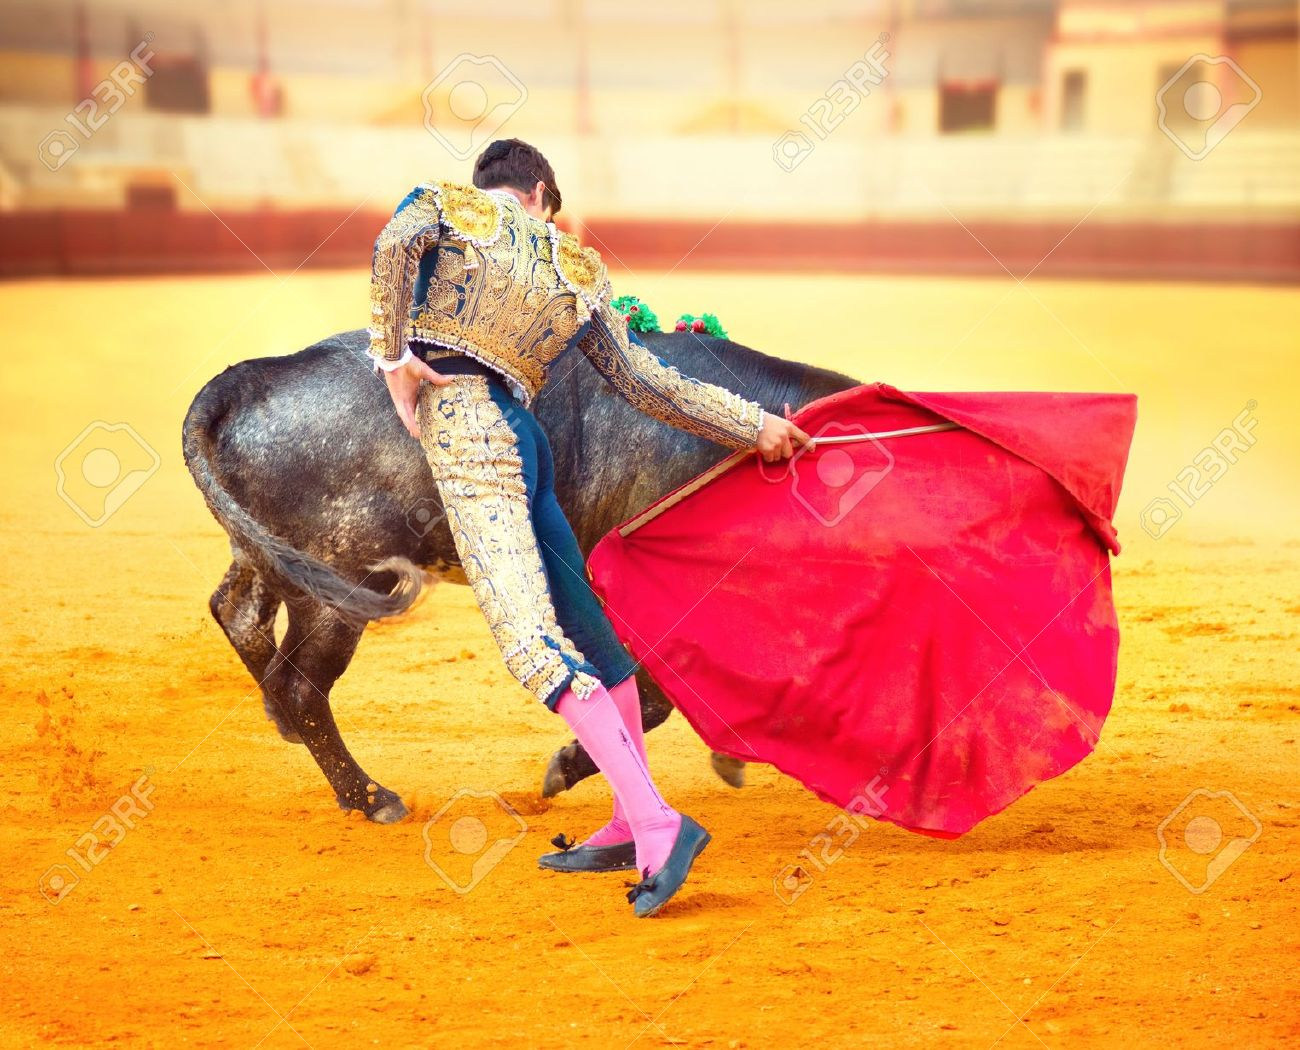 Corrida Image corrida matador fighting in a typical spanish bullfight stock photo